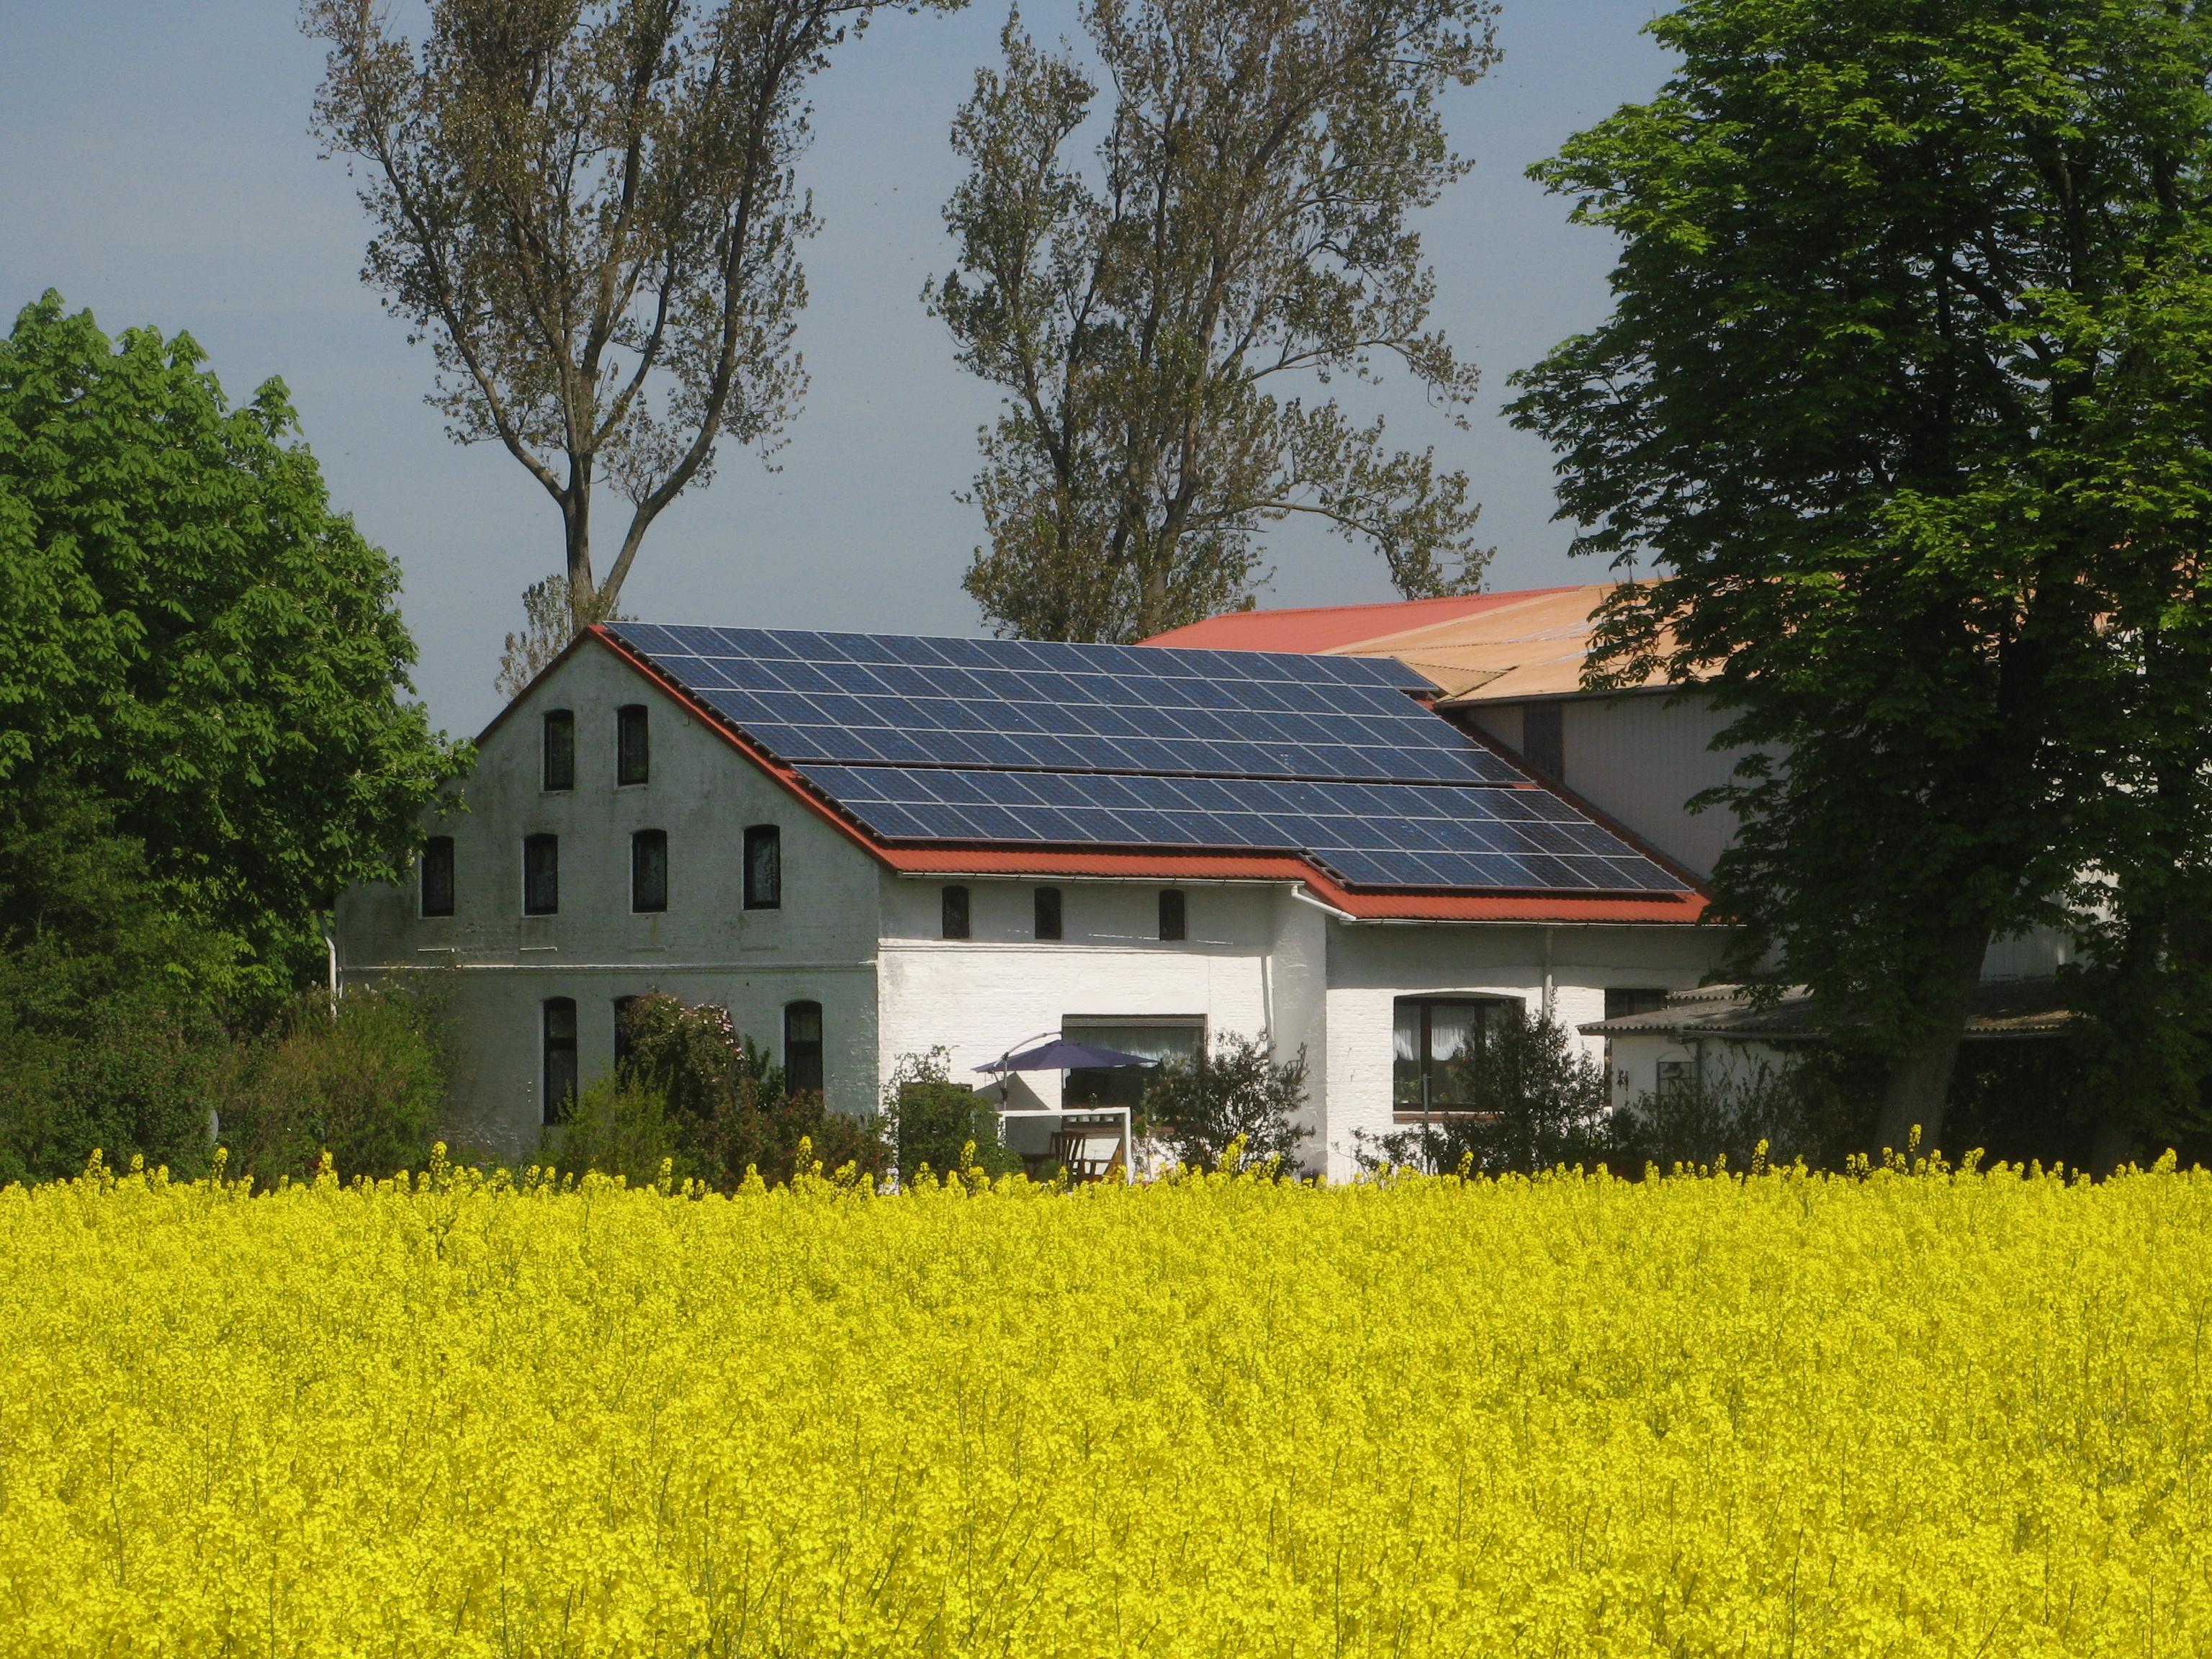 Energias limpias y renovables yahoo dating